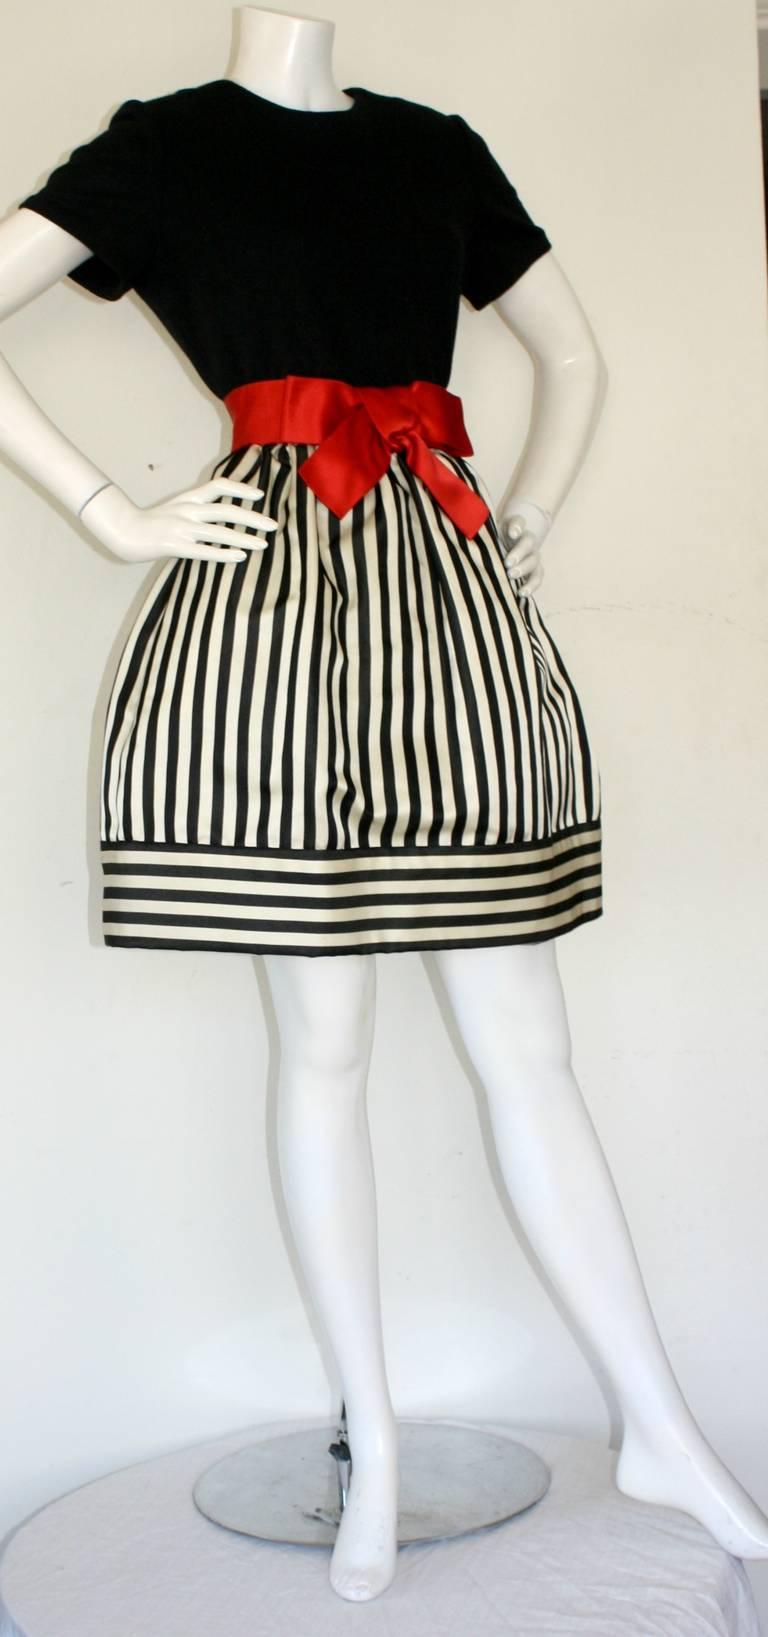 Bill Blass Vintage Black & White Stripe Dress w/ Red Bow Belt For Sale 3